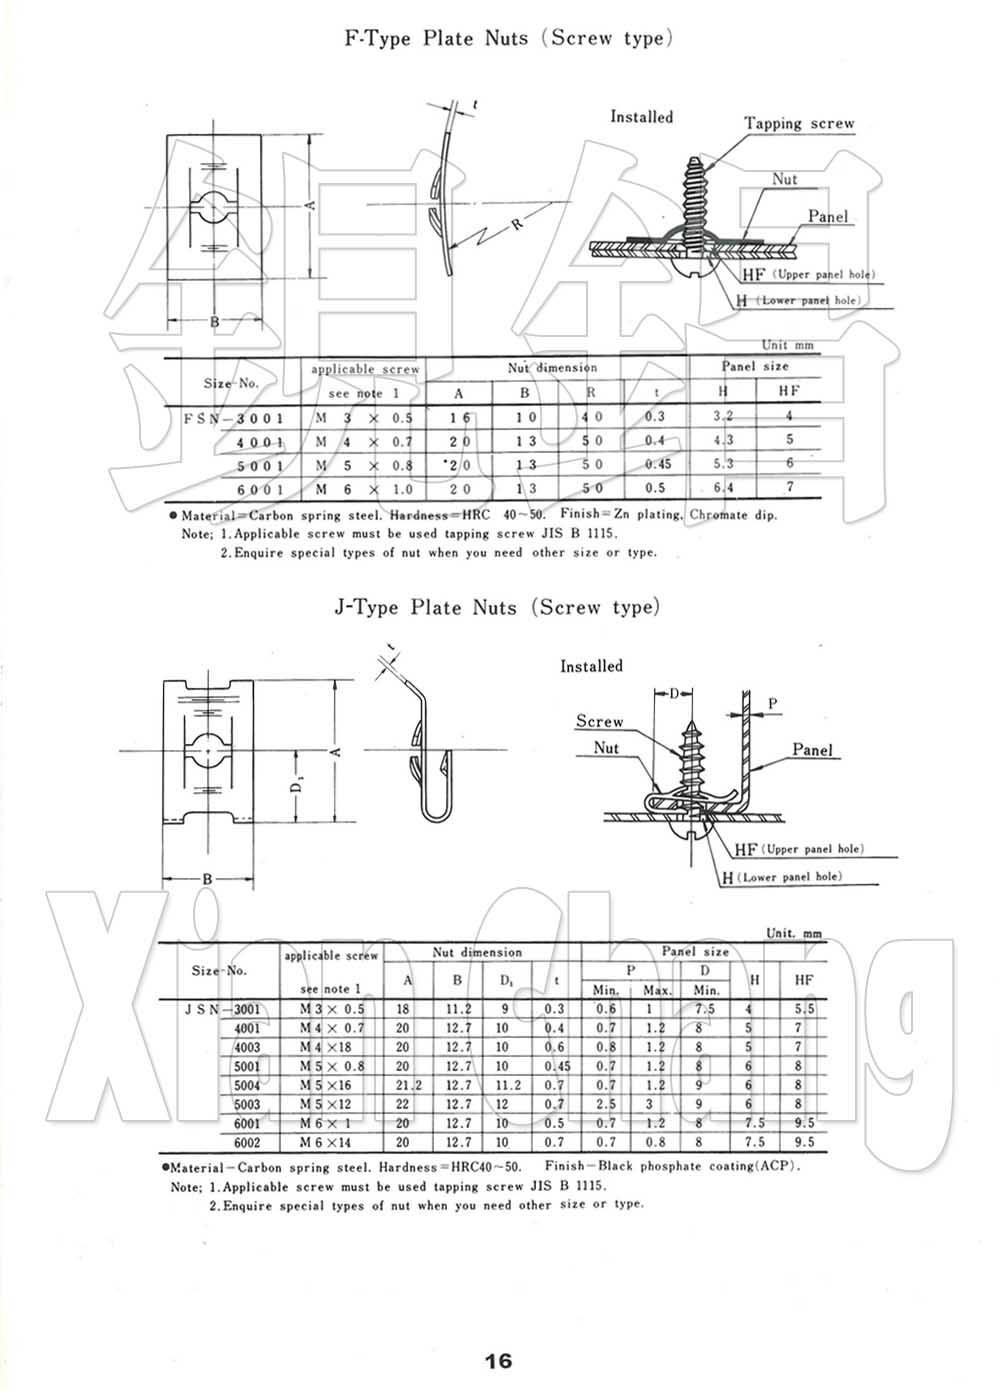 F-Type Plate Nuts (Screw Type)F型彈片,夾片螺帽 (螺釘型) J-Type Plate Nuts (Screw Type)J型彈片,夾片螺帽(螺釘型)